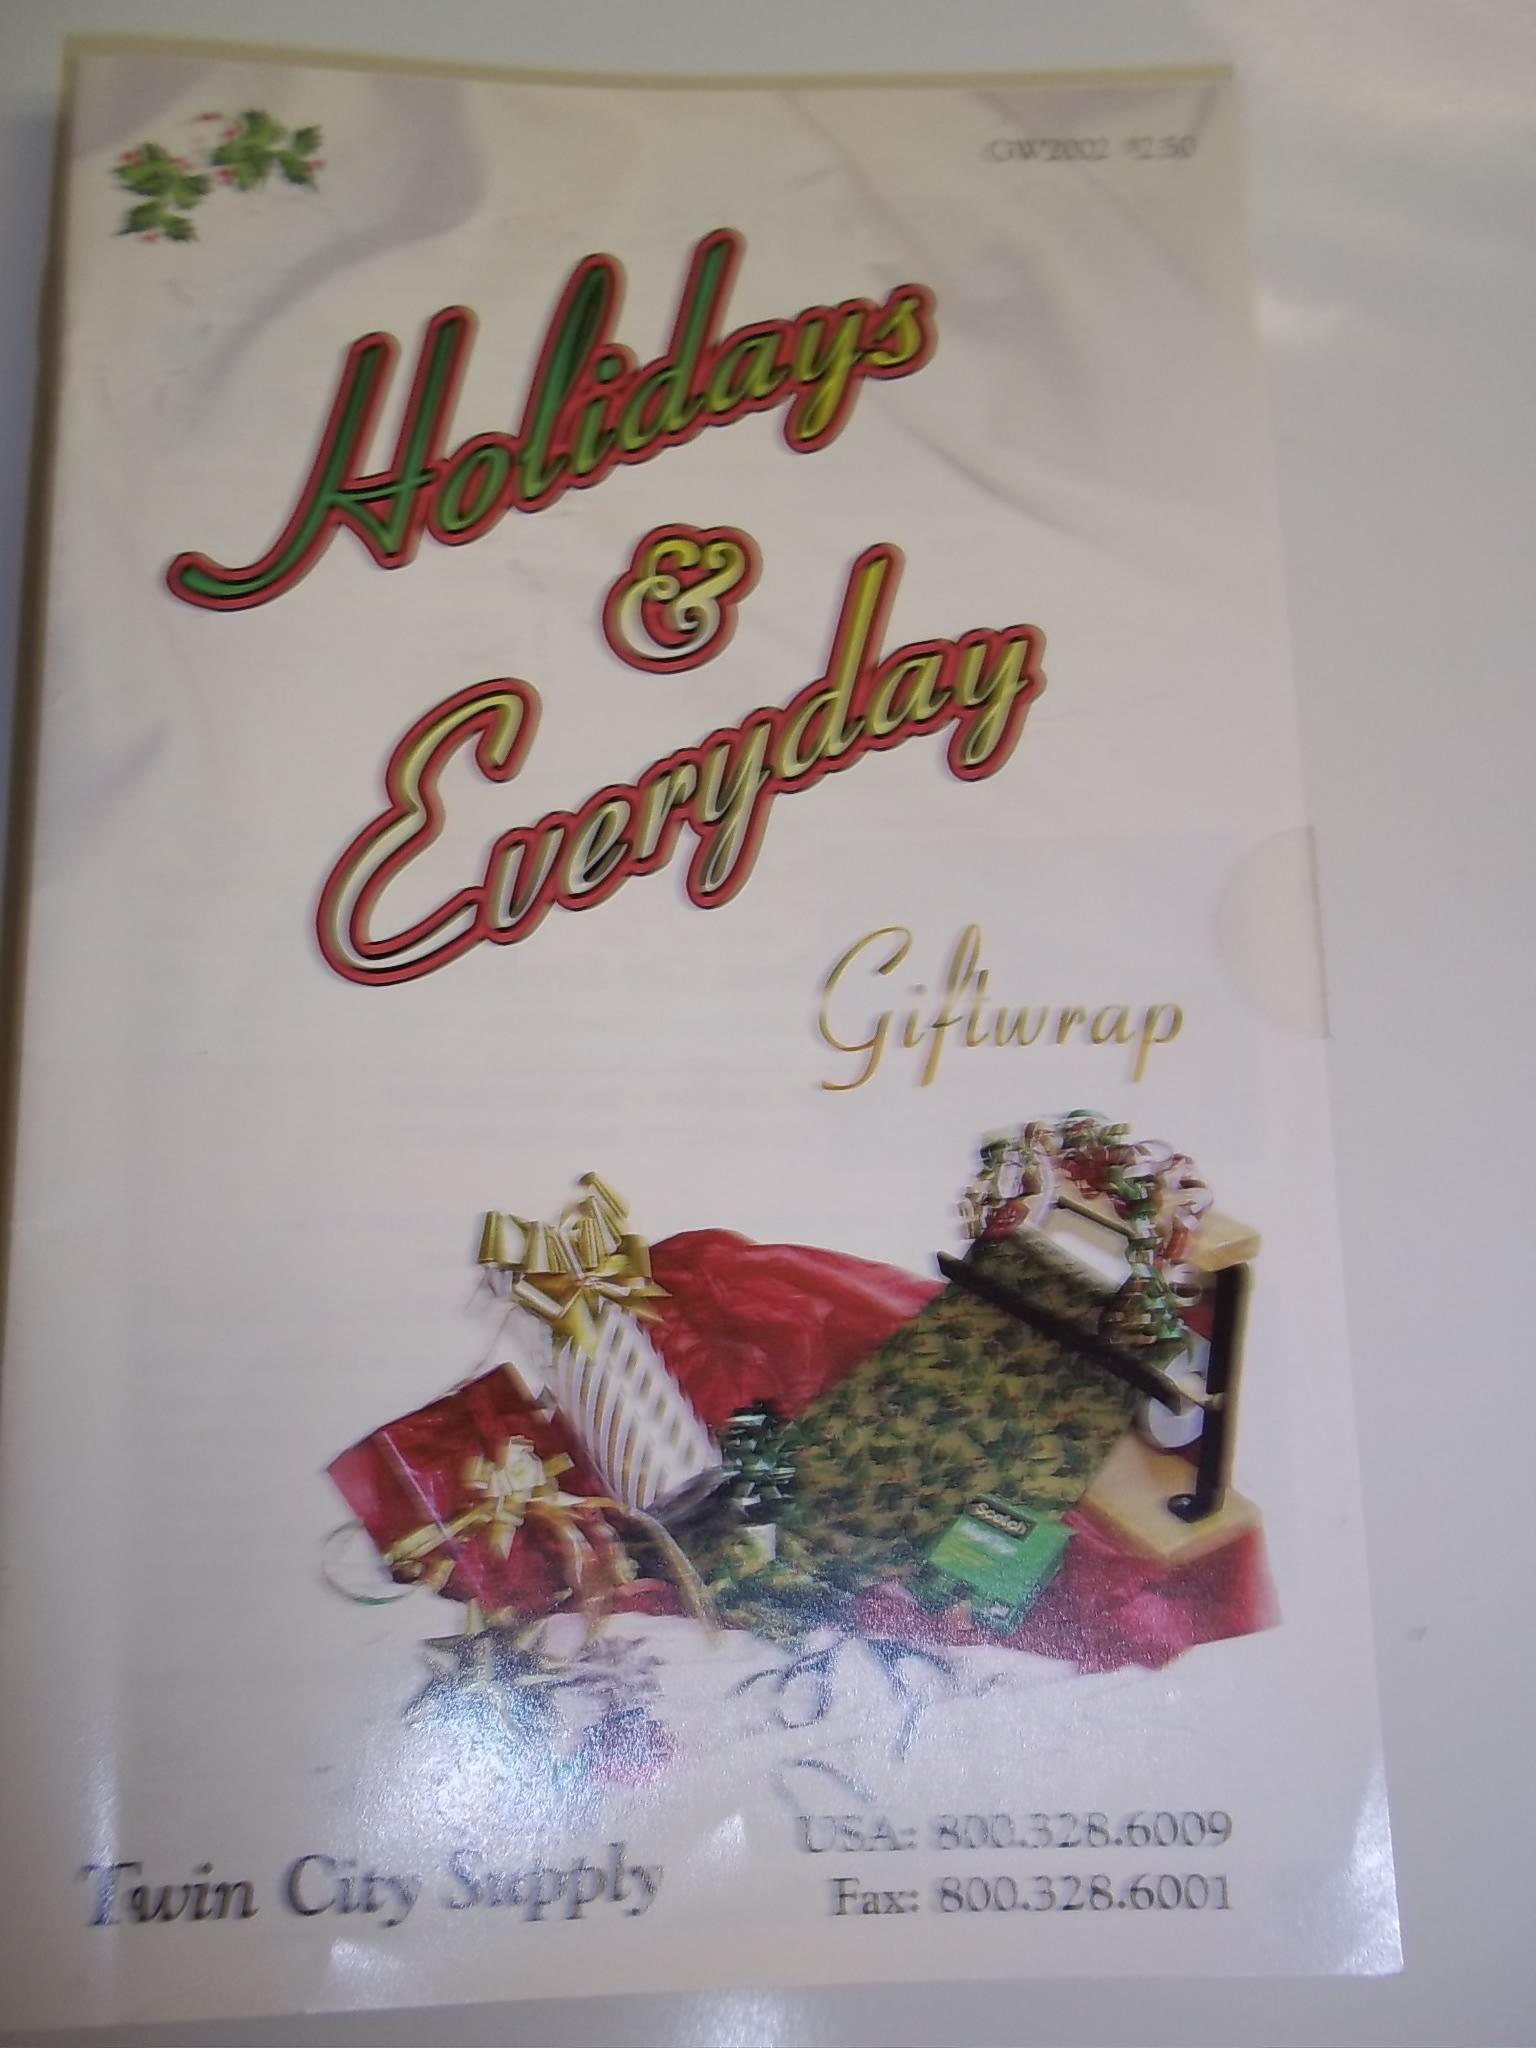 BKGW2002 GiftWrap Booklet